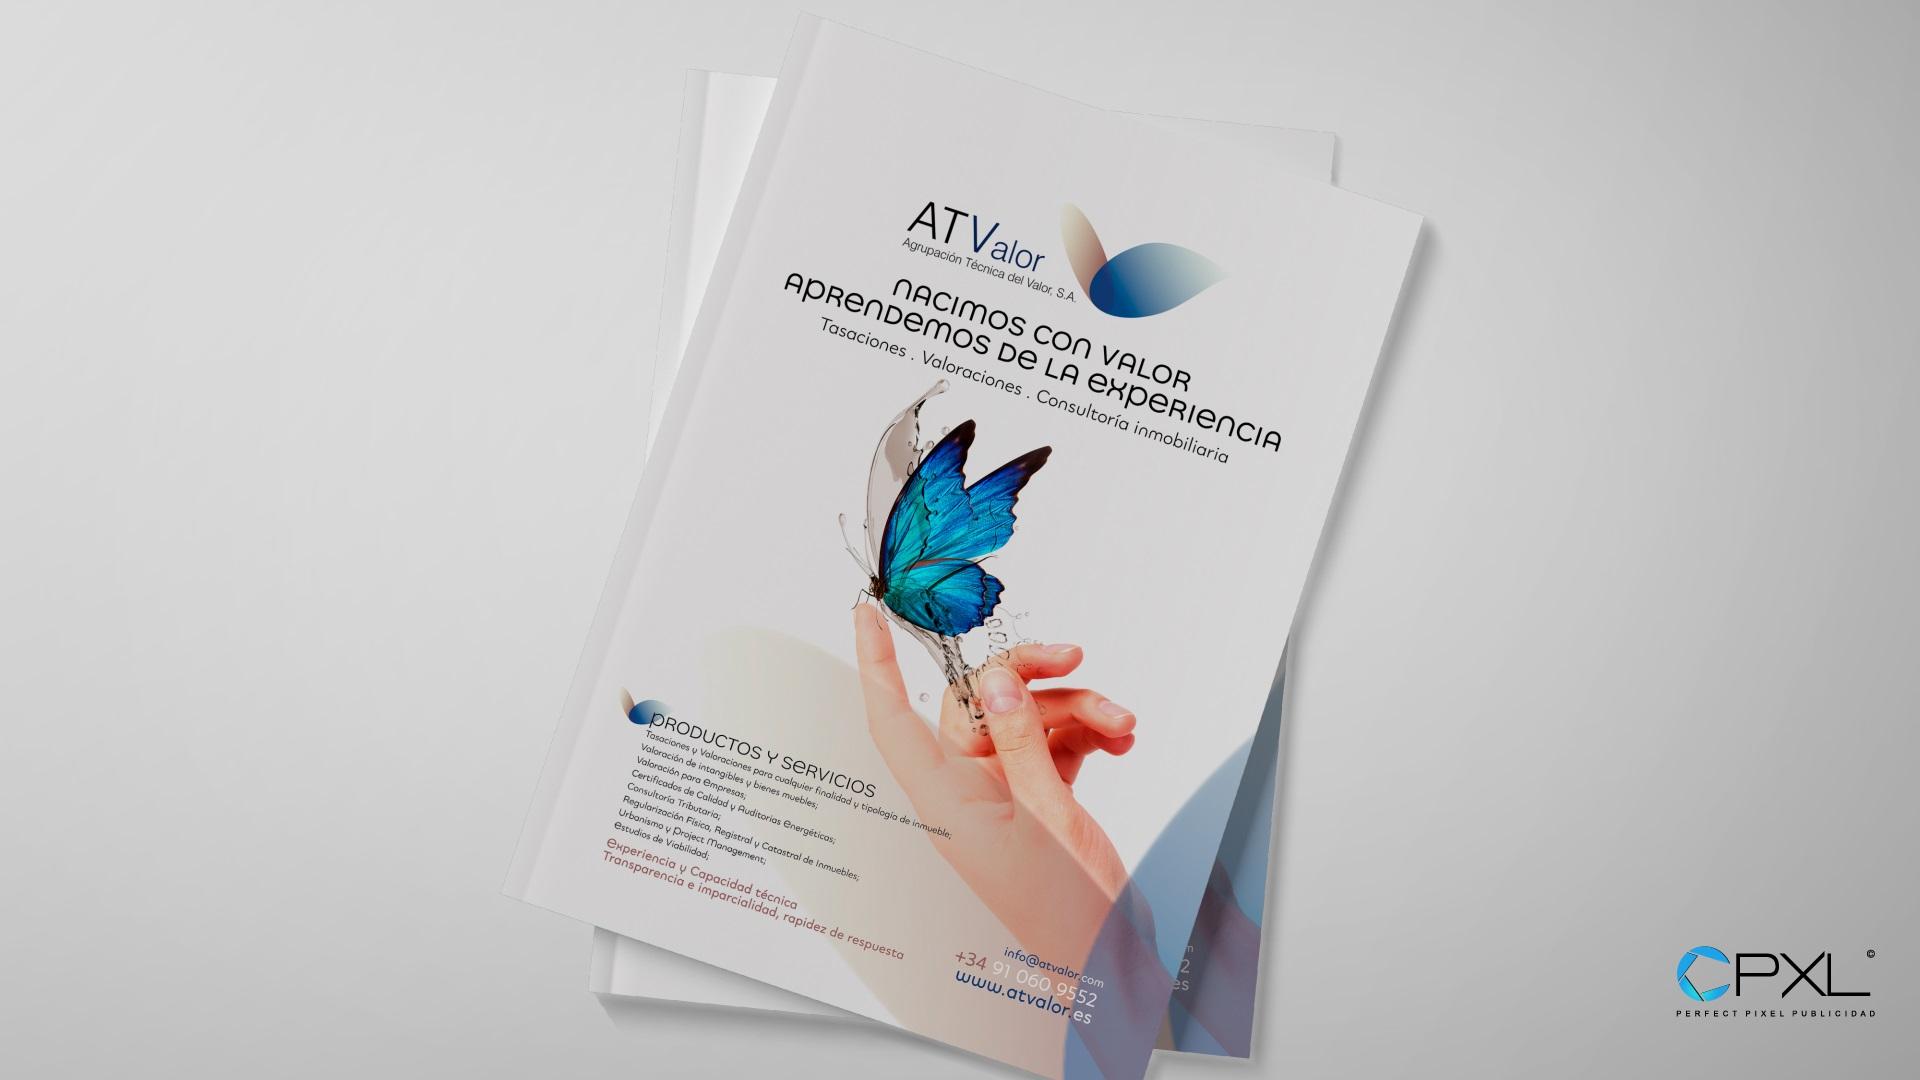 https://perfectpixel.es/wp-content/uploads/2017/08/ATValor-Agrupacion-tecnica-de-valor-Tasaciones-Agencia-en-Madrid-Perfect-Pixel-Publicidad-Revista-3.jpg